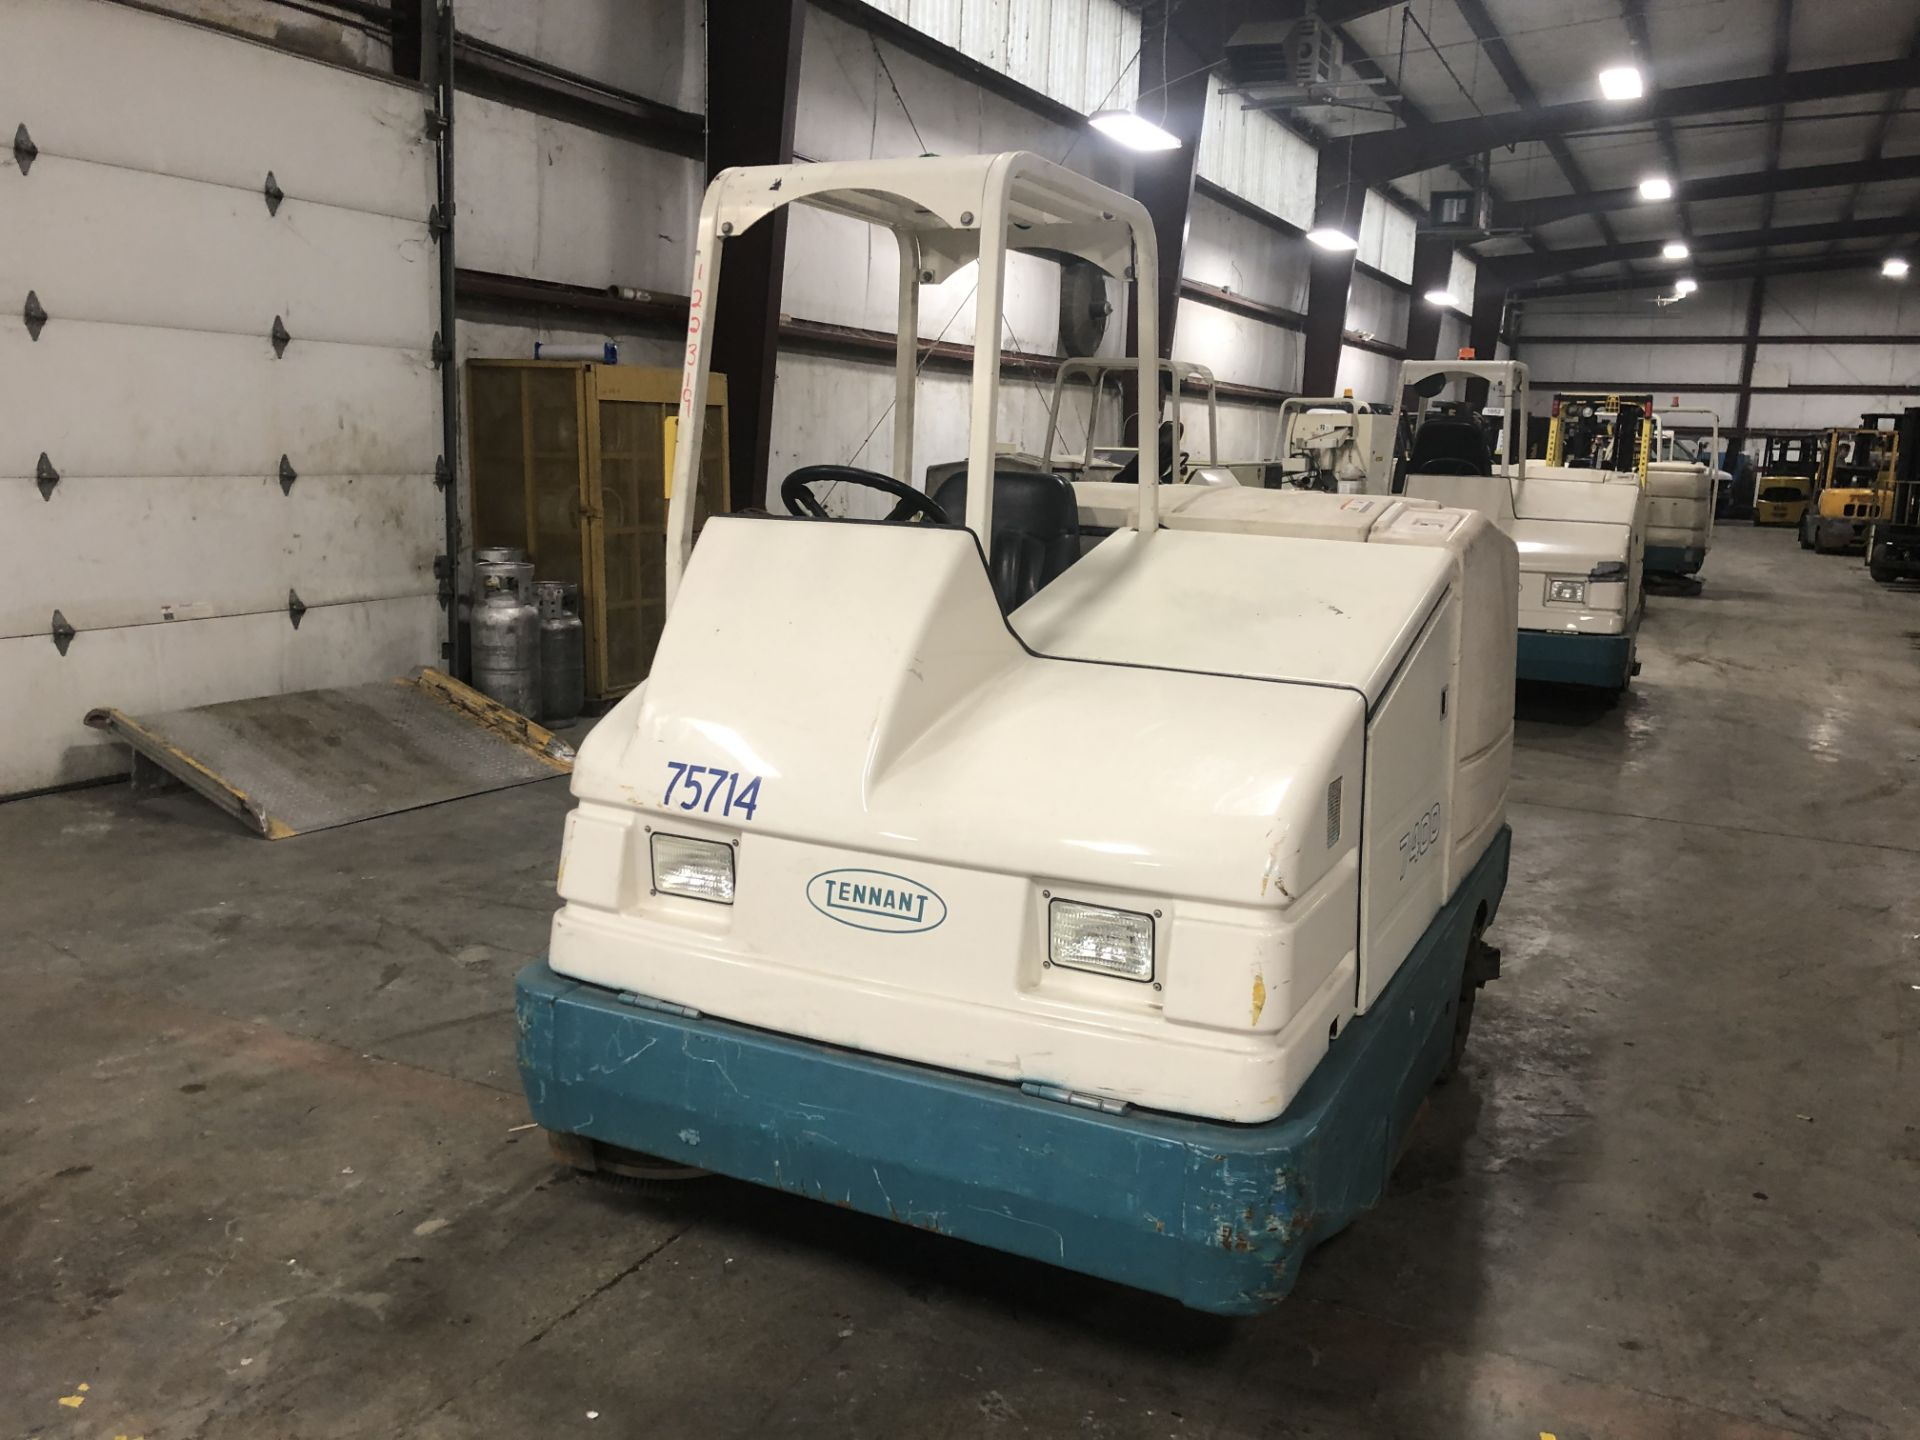 Lot 28A - Tennant floor sweeper/scrubber, model: 7400, S/N: 7400-3714, LPG, 2,129 hours